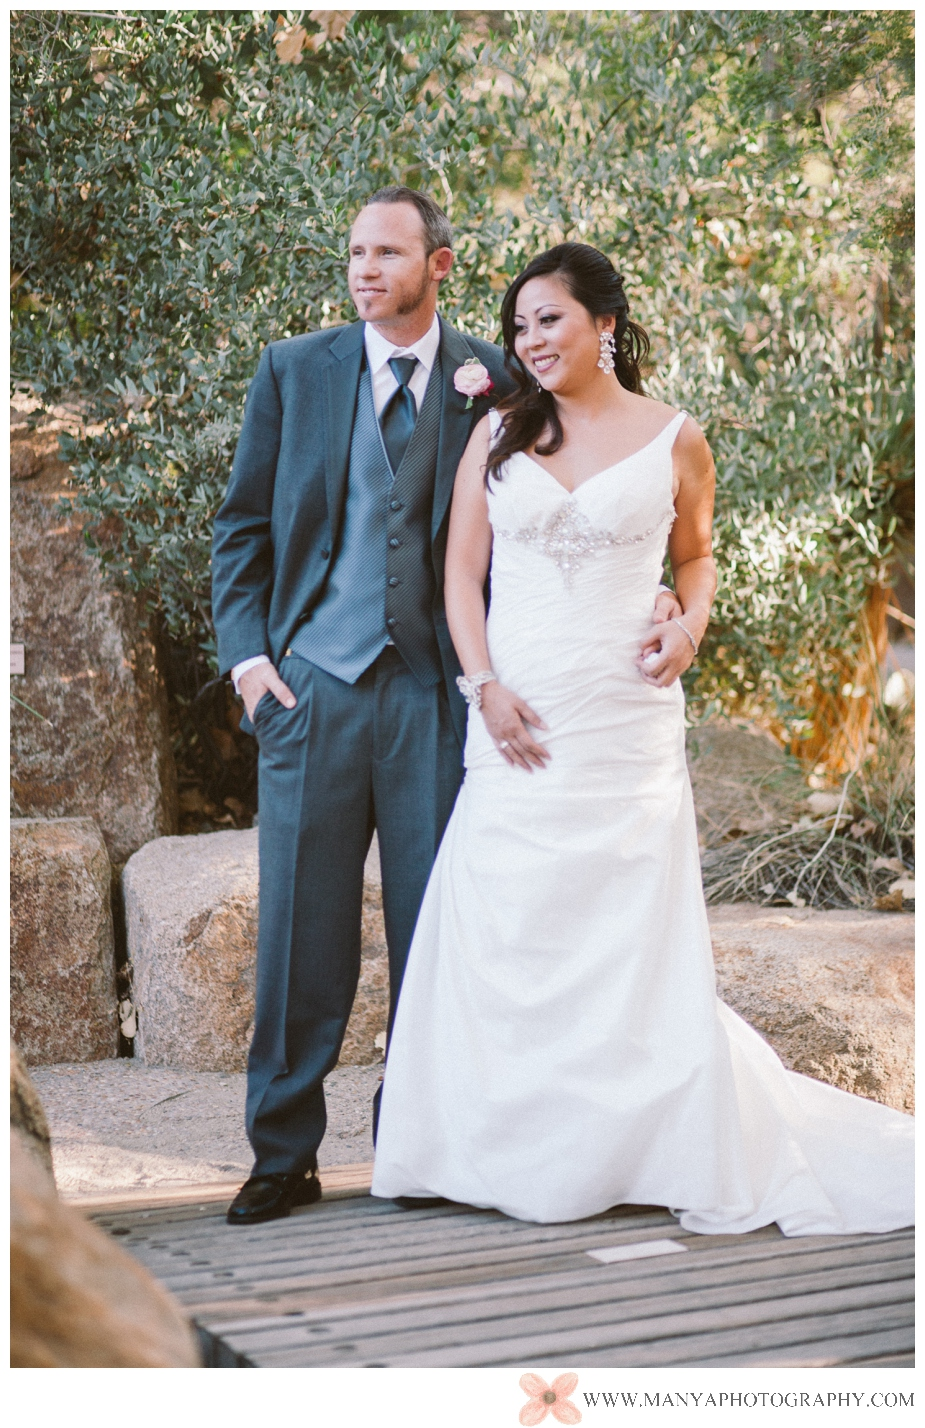 2013-07-28_0022 - Orange County Wedding Photographer